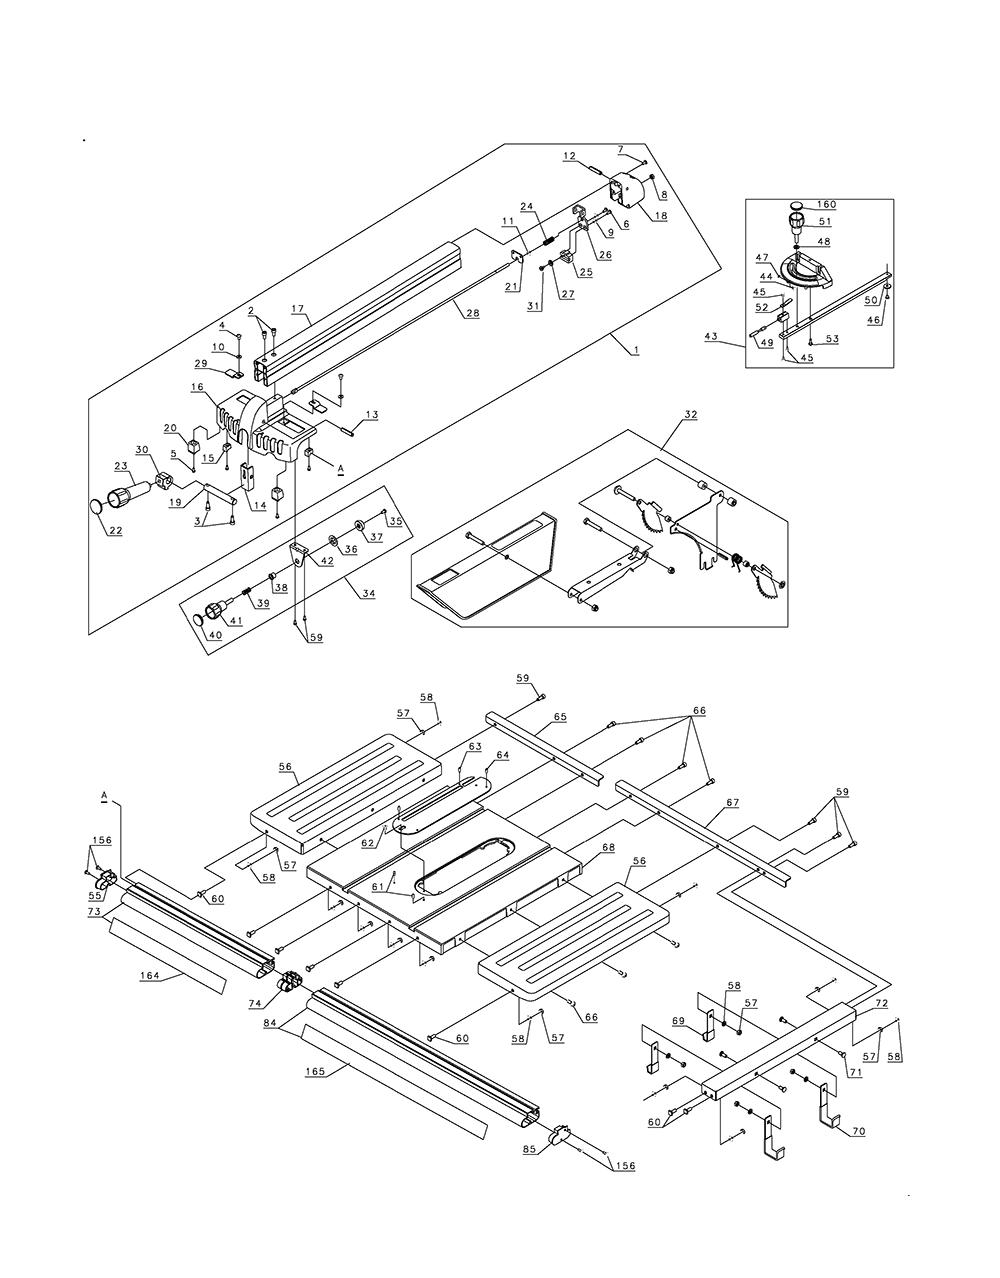 BT2500-BlackandDecker-T1-PB-1Break Down